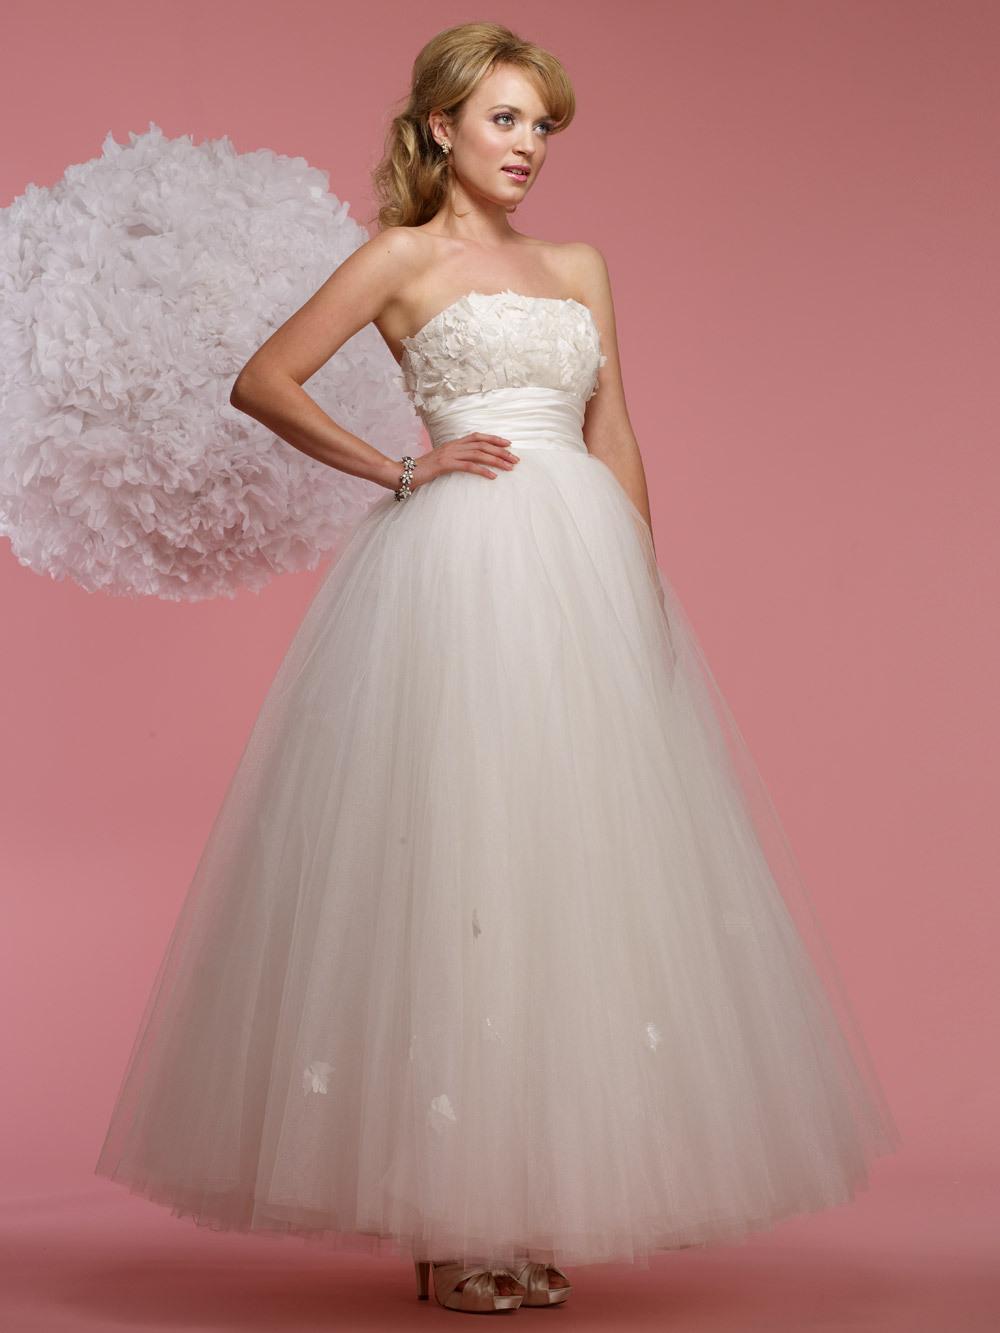 vintage inspired wedding dress 2012 bridal gowns steven birnbaum ...